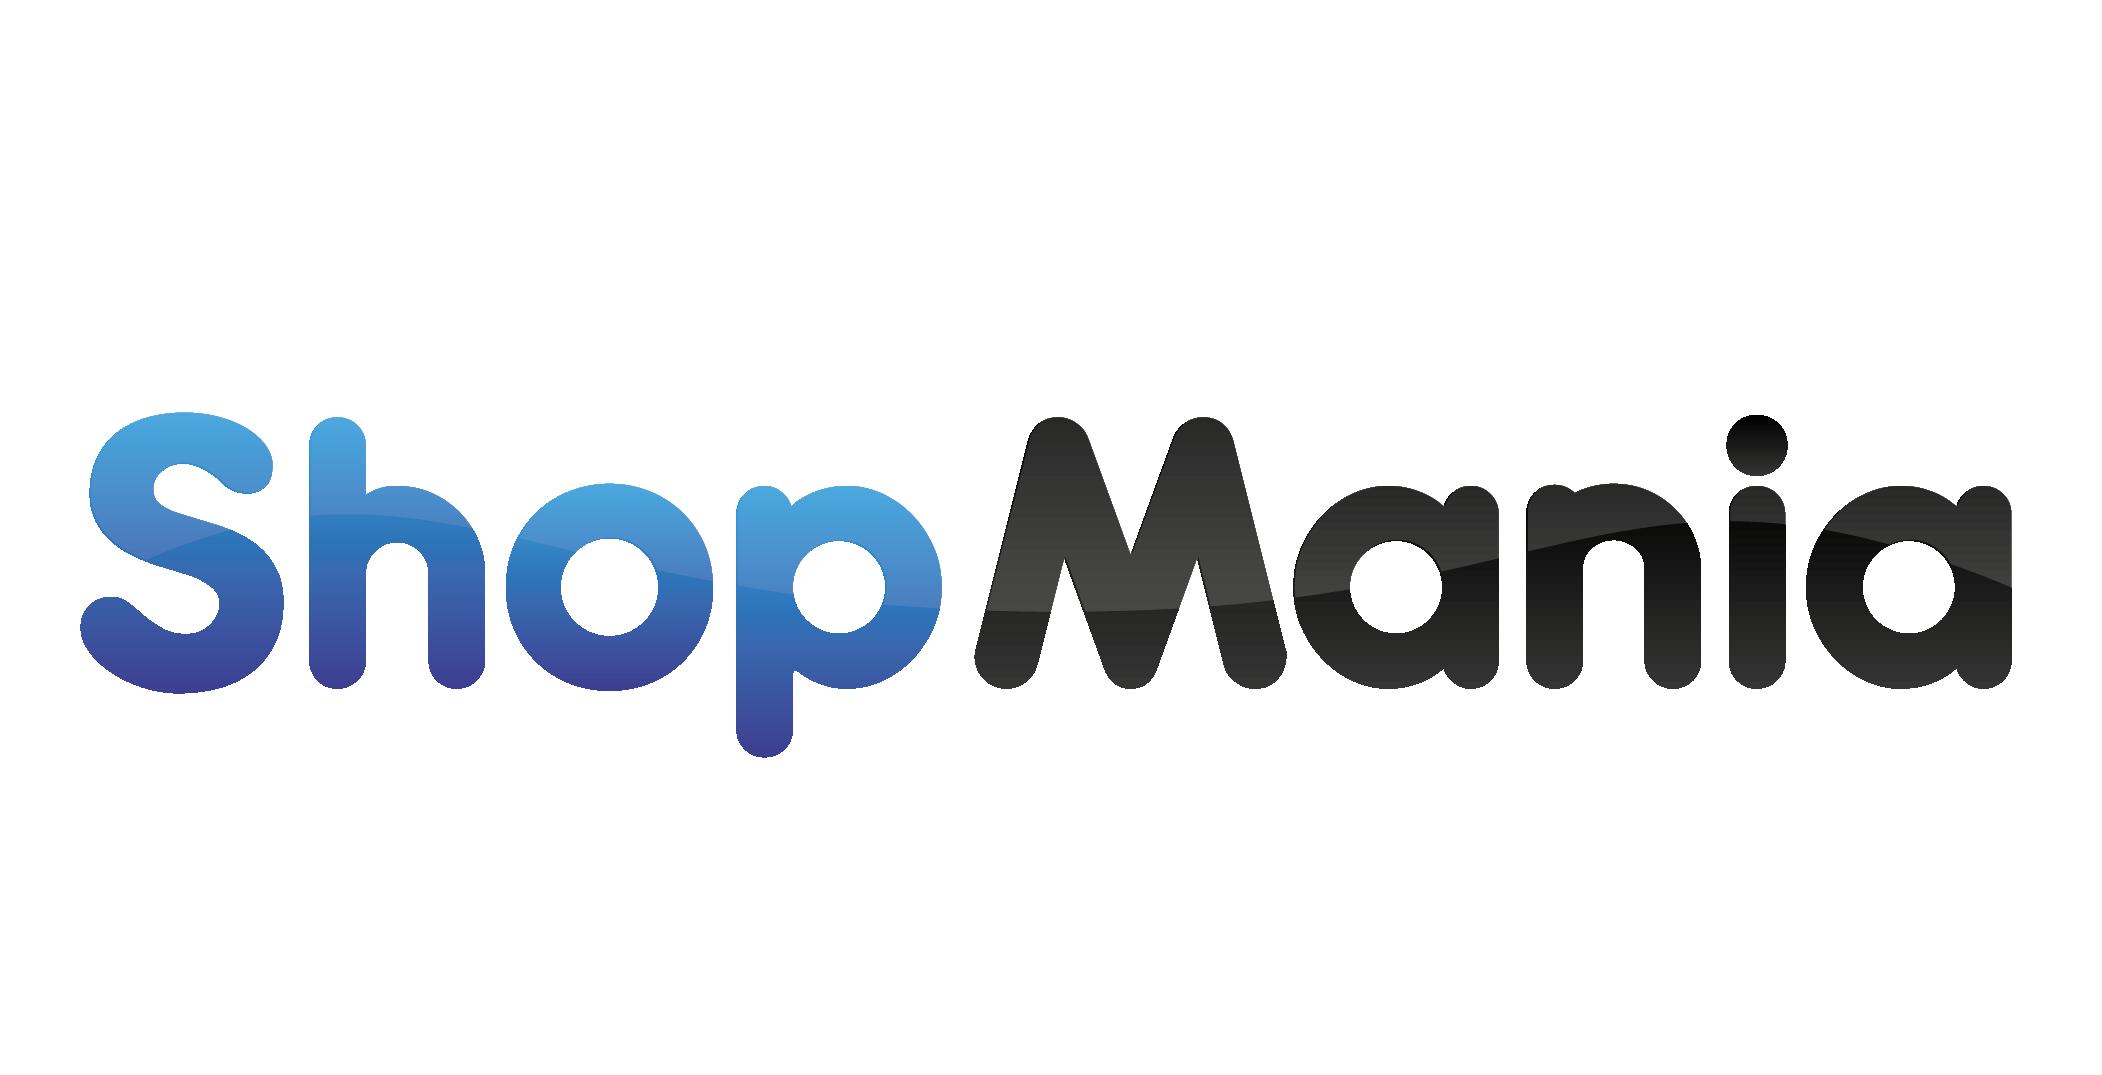 Buy Now: Shopmania